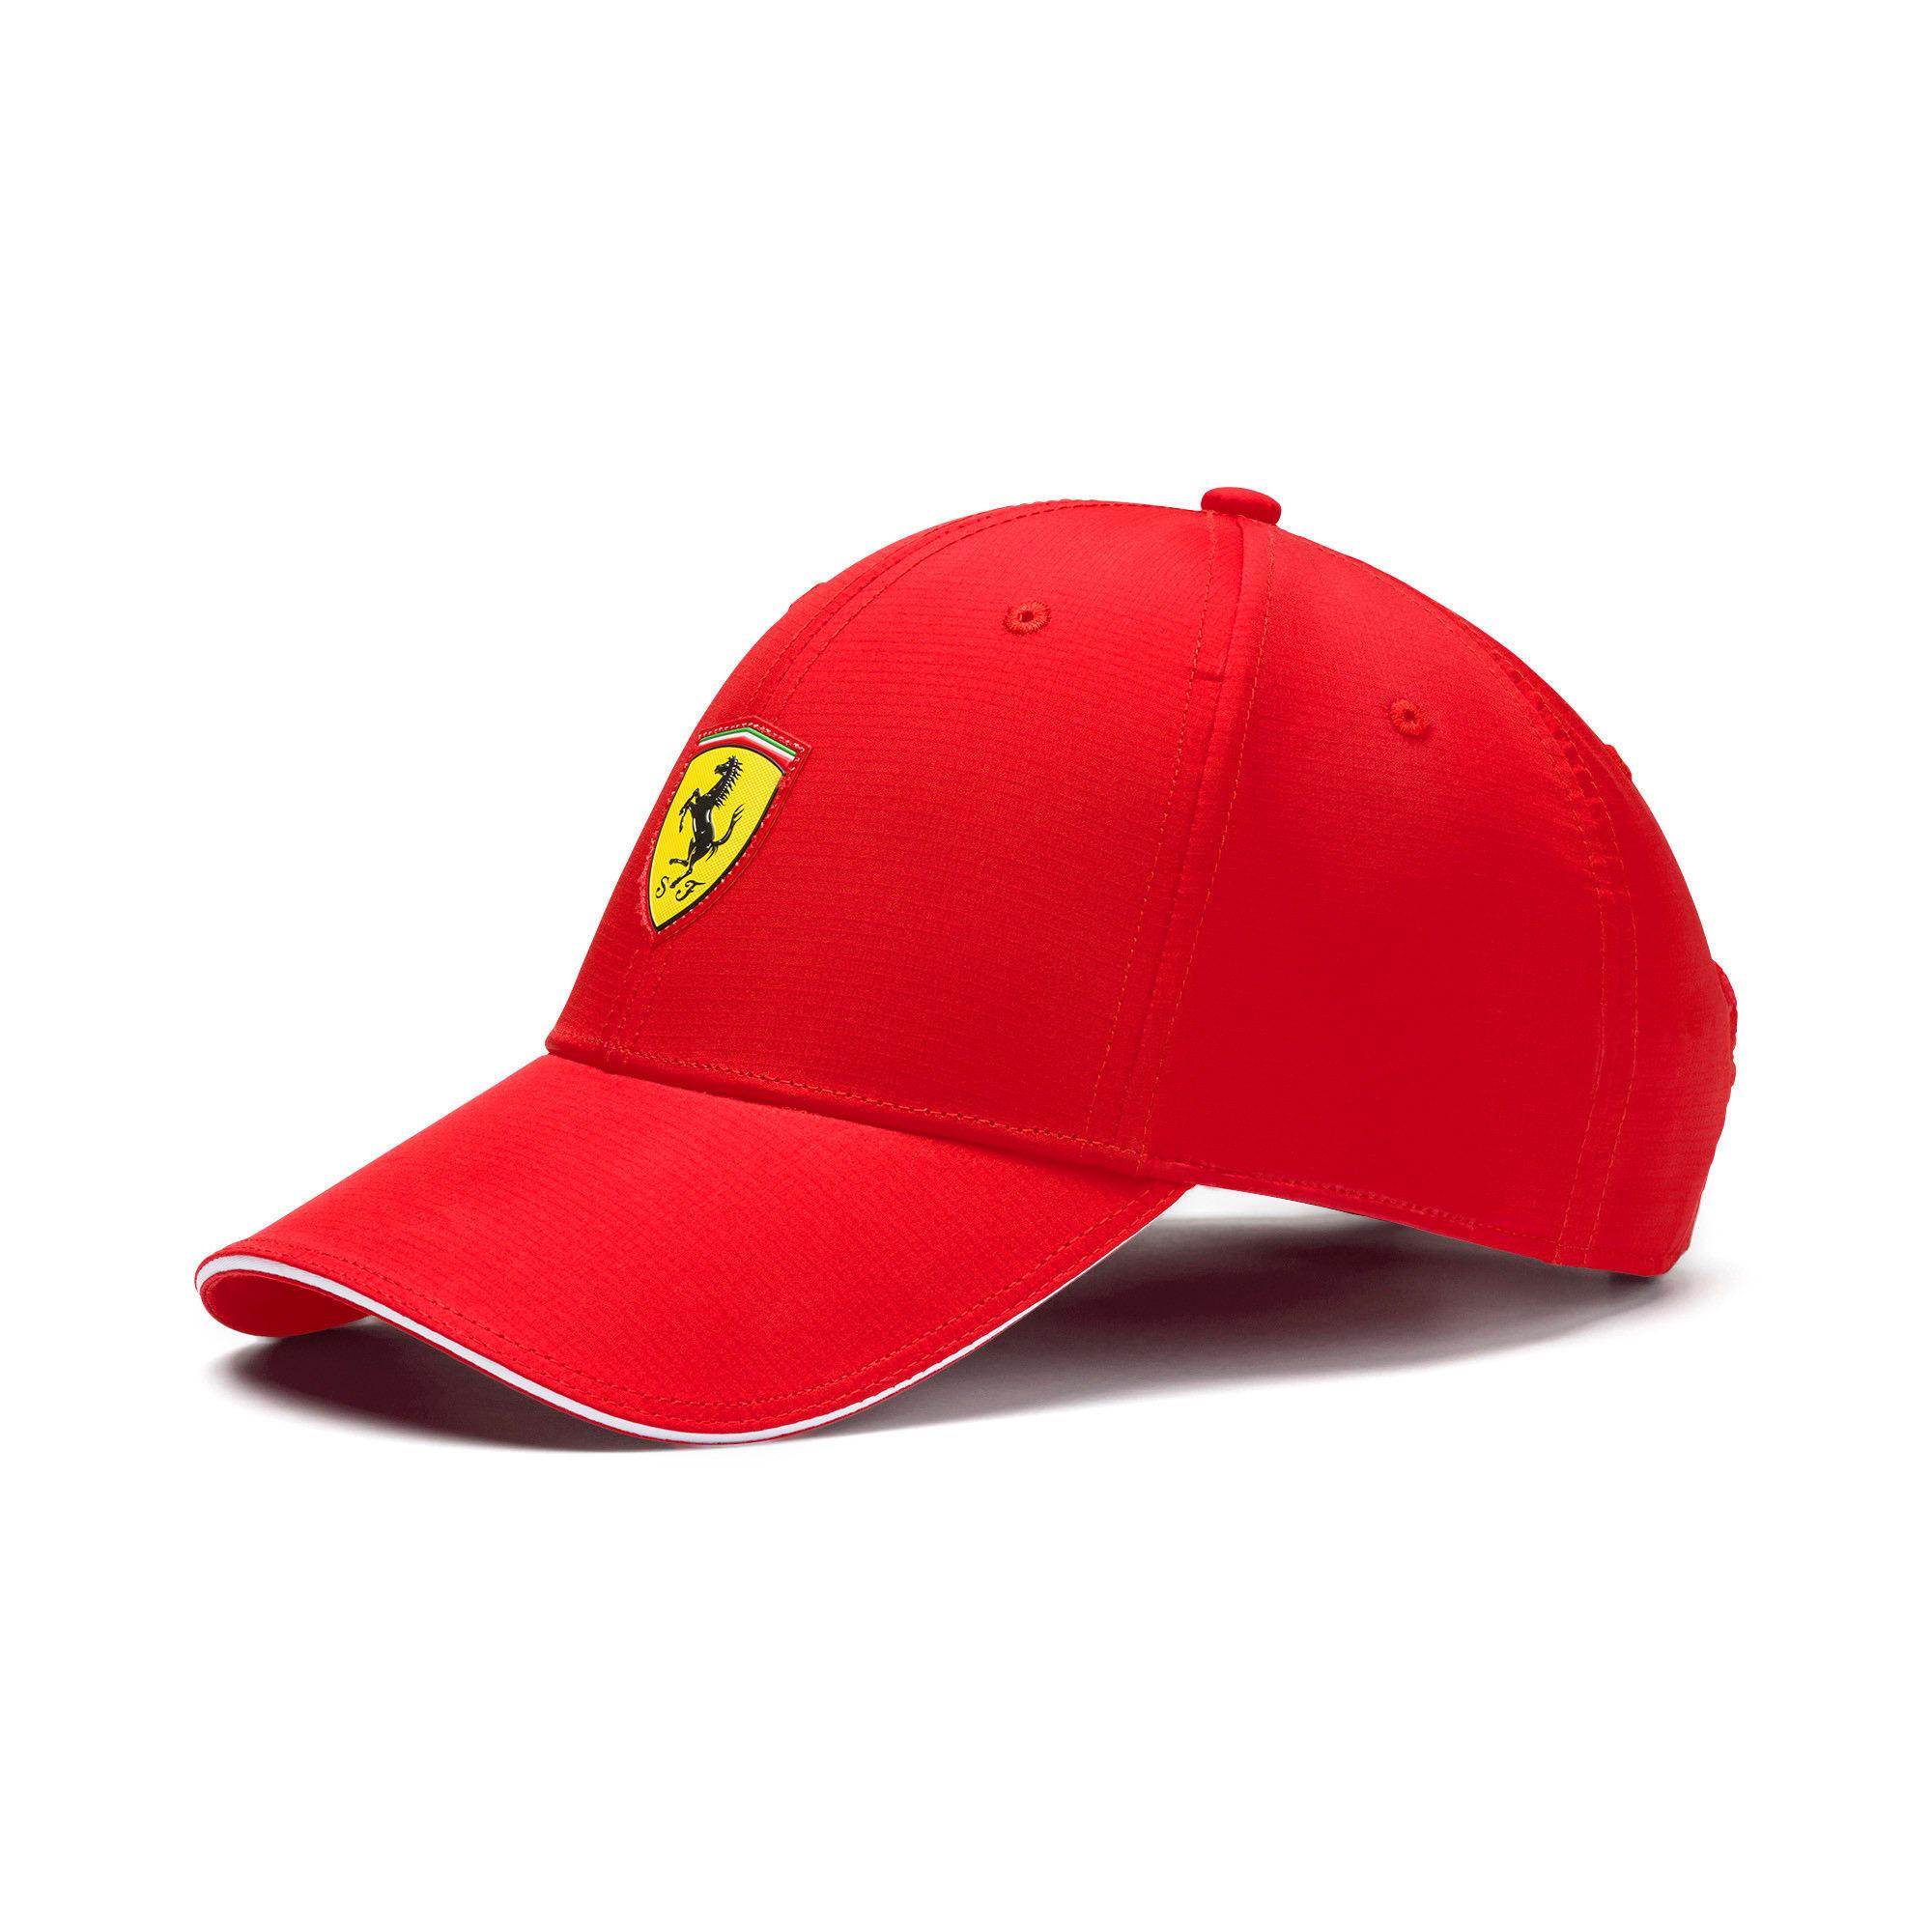 Thumbnail 1 of フェラーリ ファンウェア ベースボール キャップ, Rosso Corsa, medium-JPN